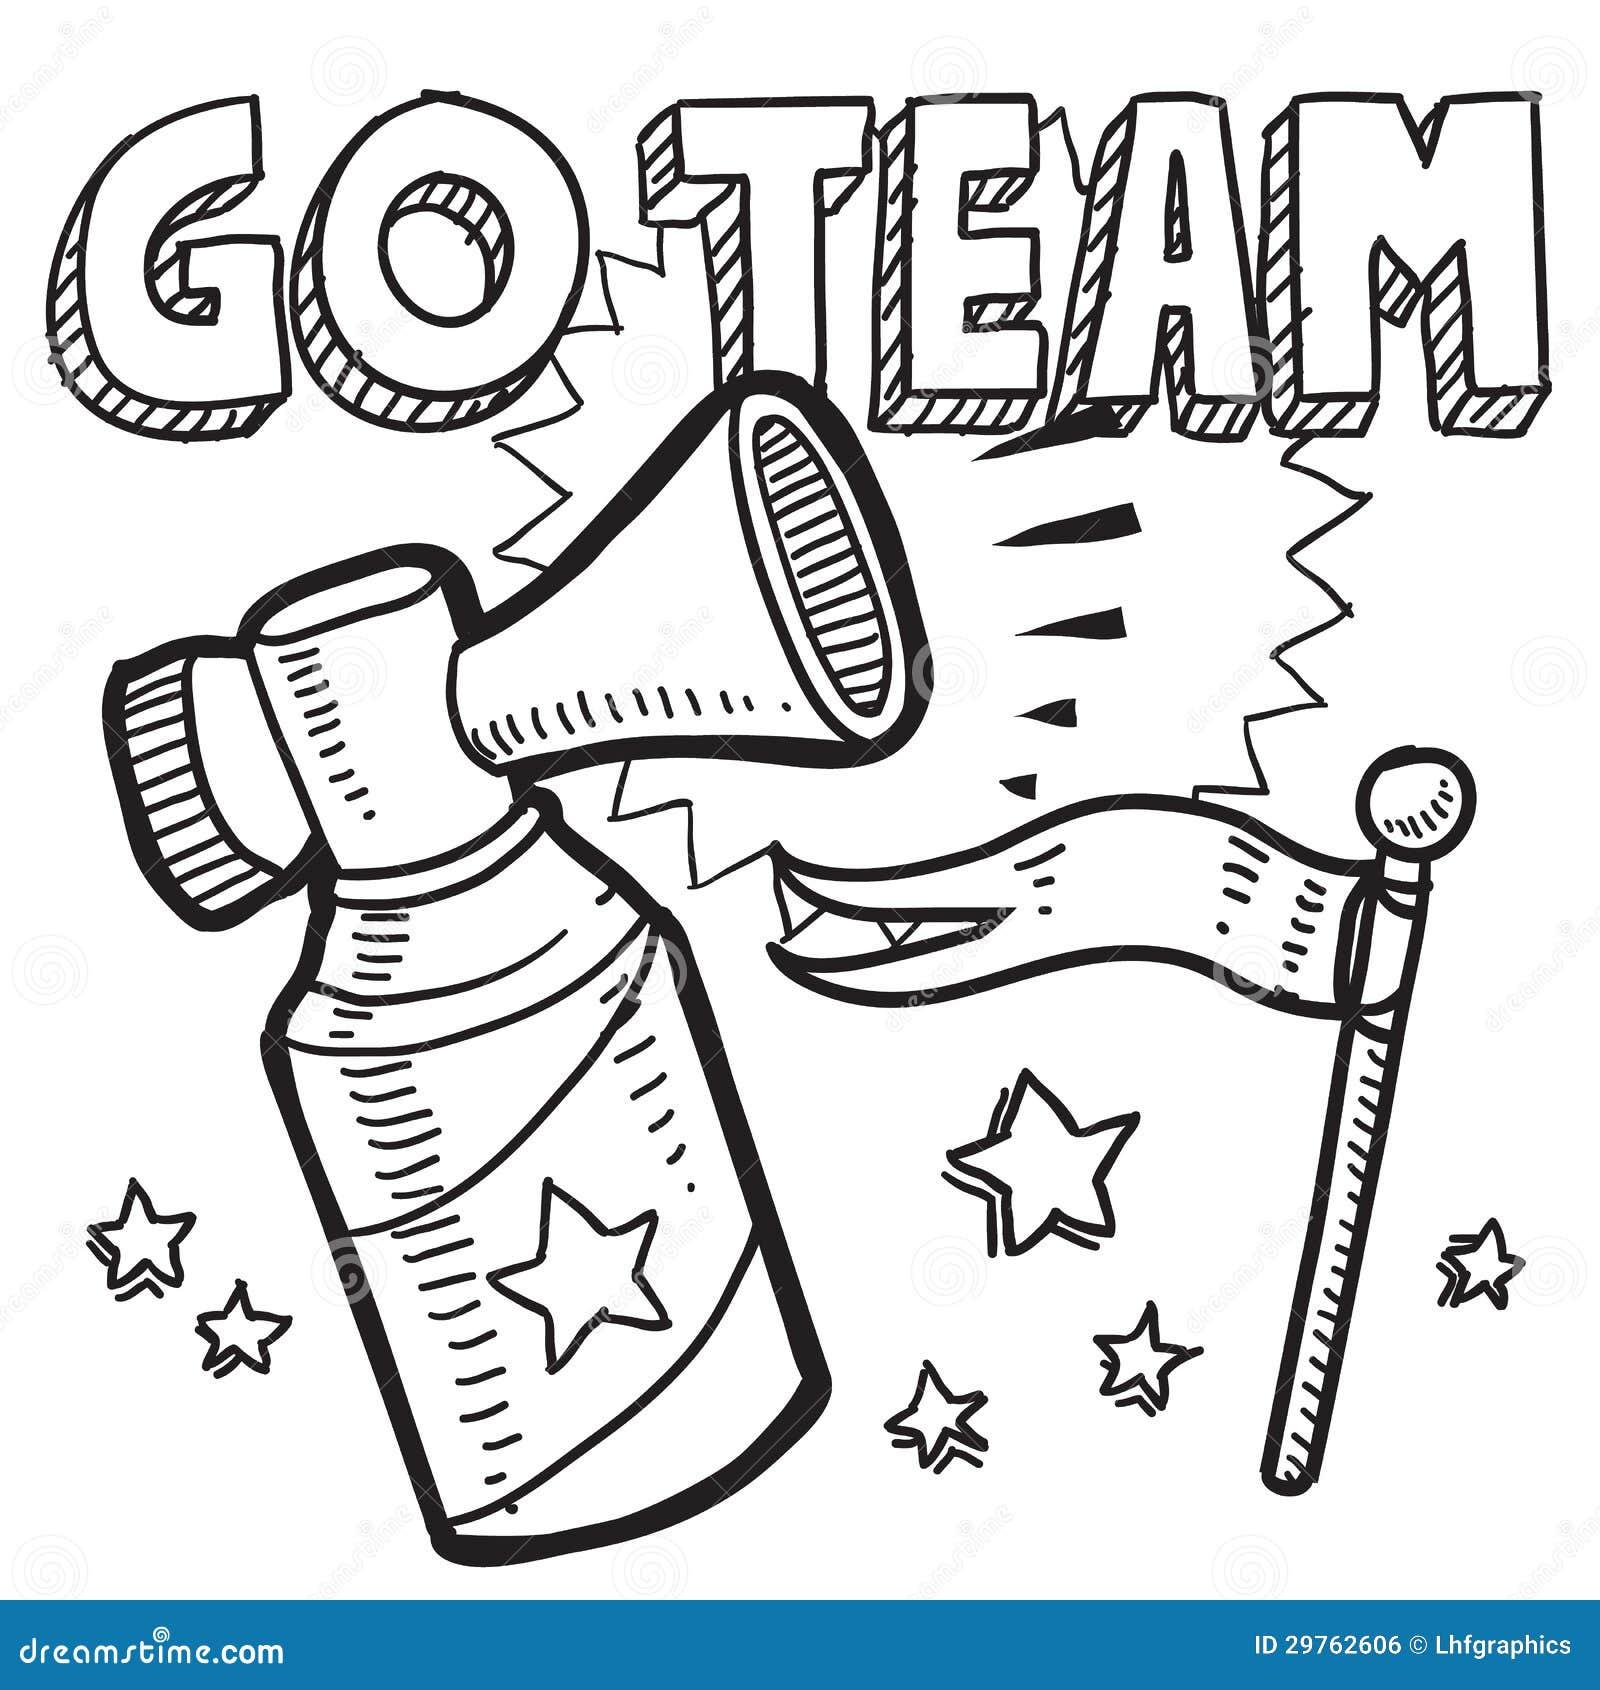 Go Team Sports Air Horn Sketch Stock Vector - Illustration of